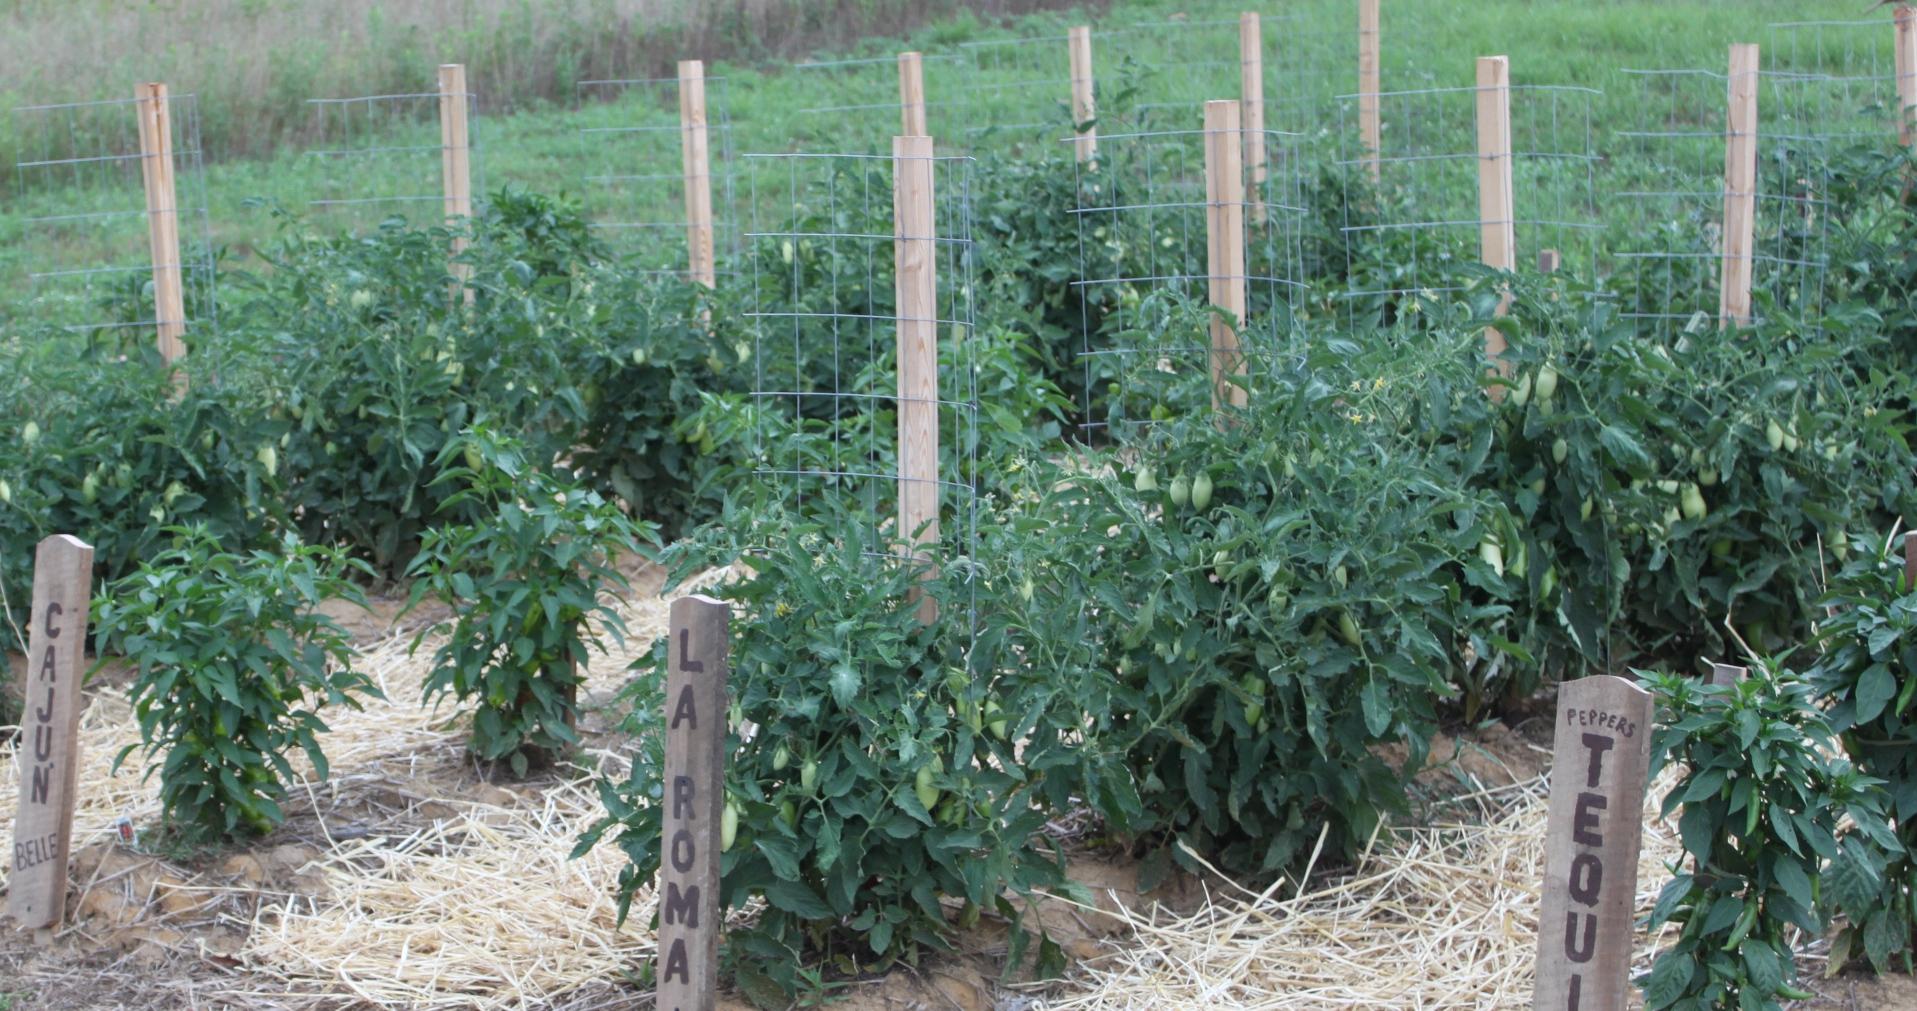 Simple tips to building great garden soil naturally for Garden soil